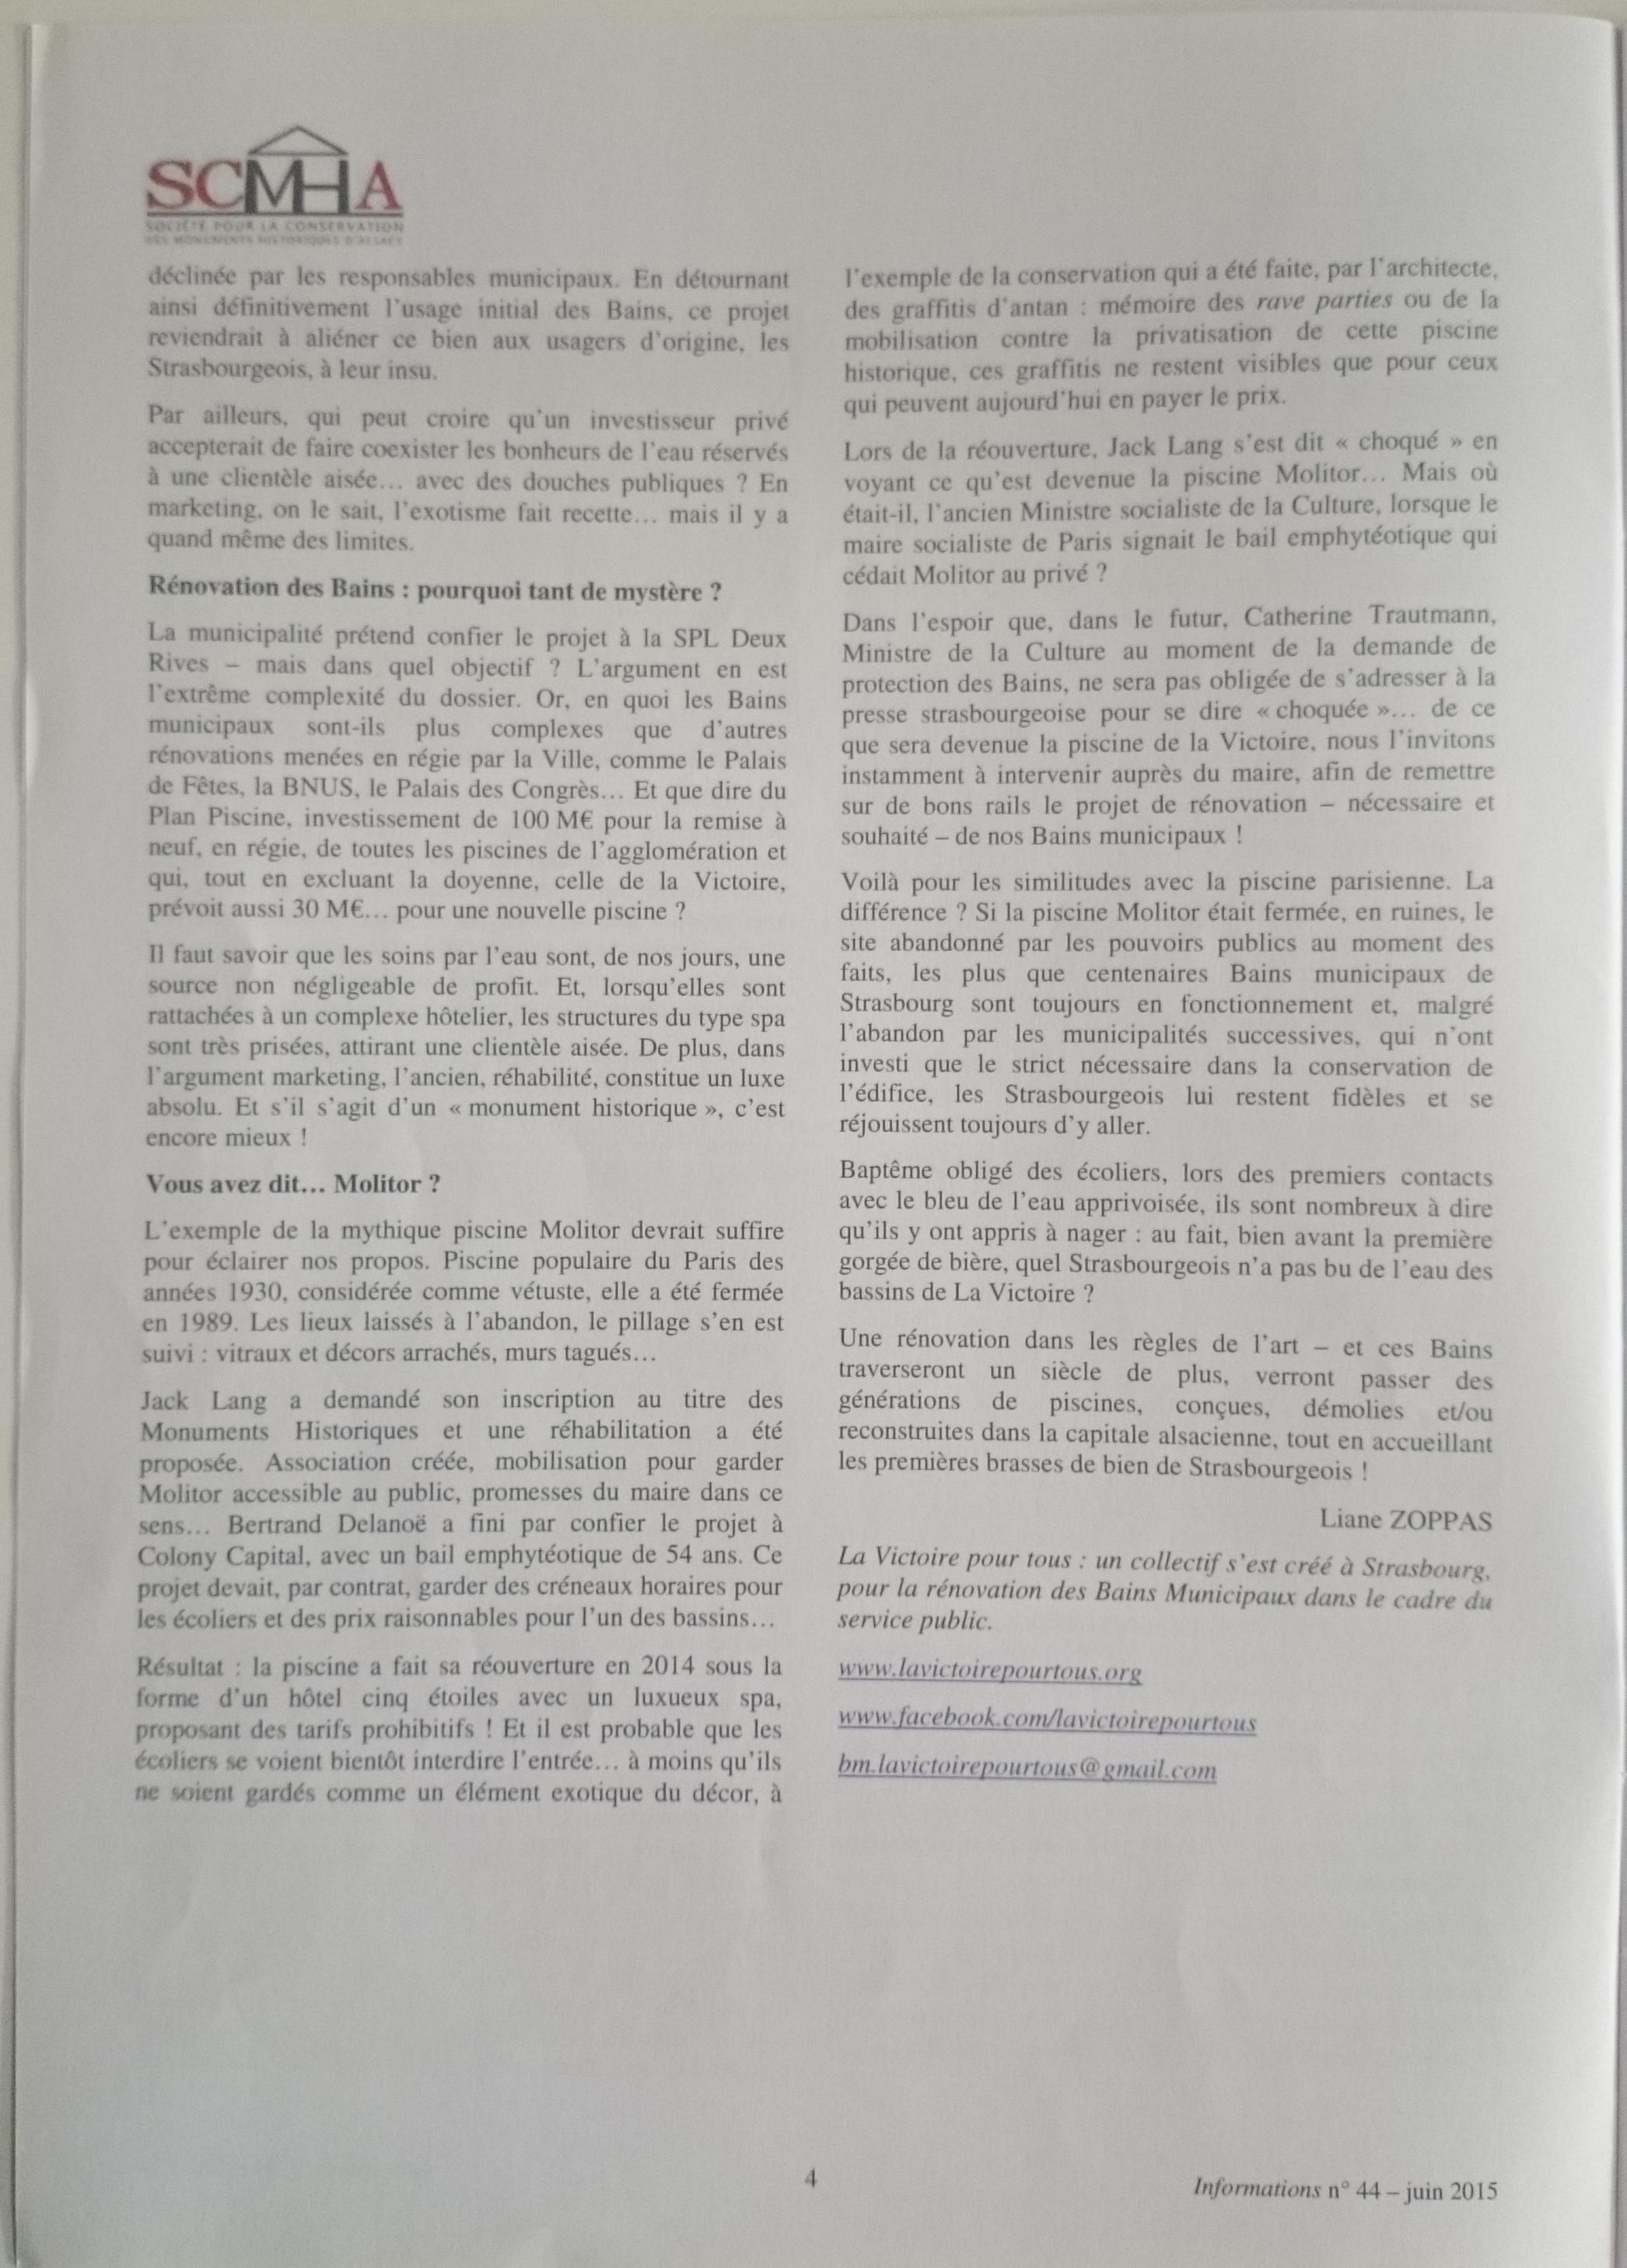 SCMHA_page 4